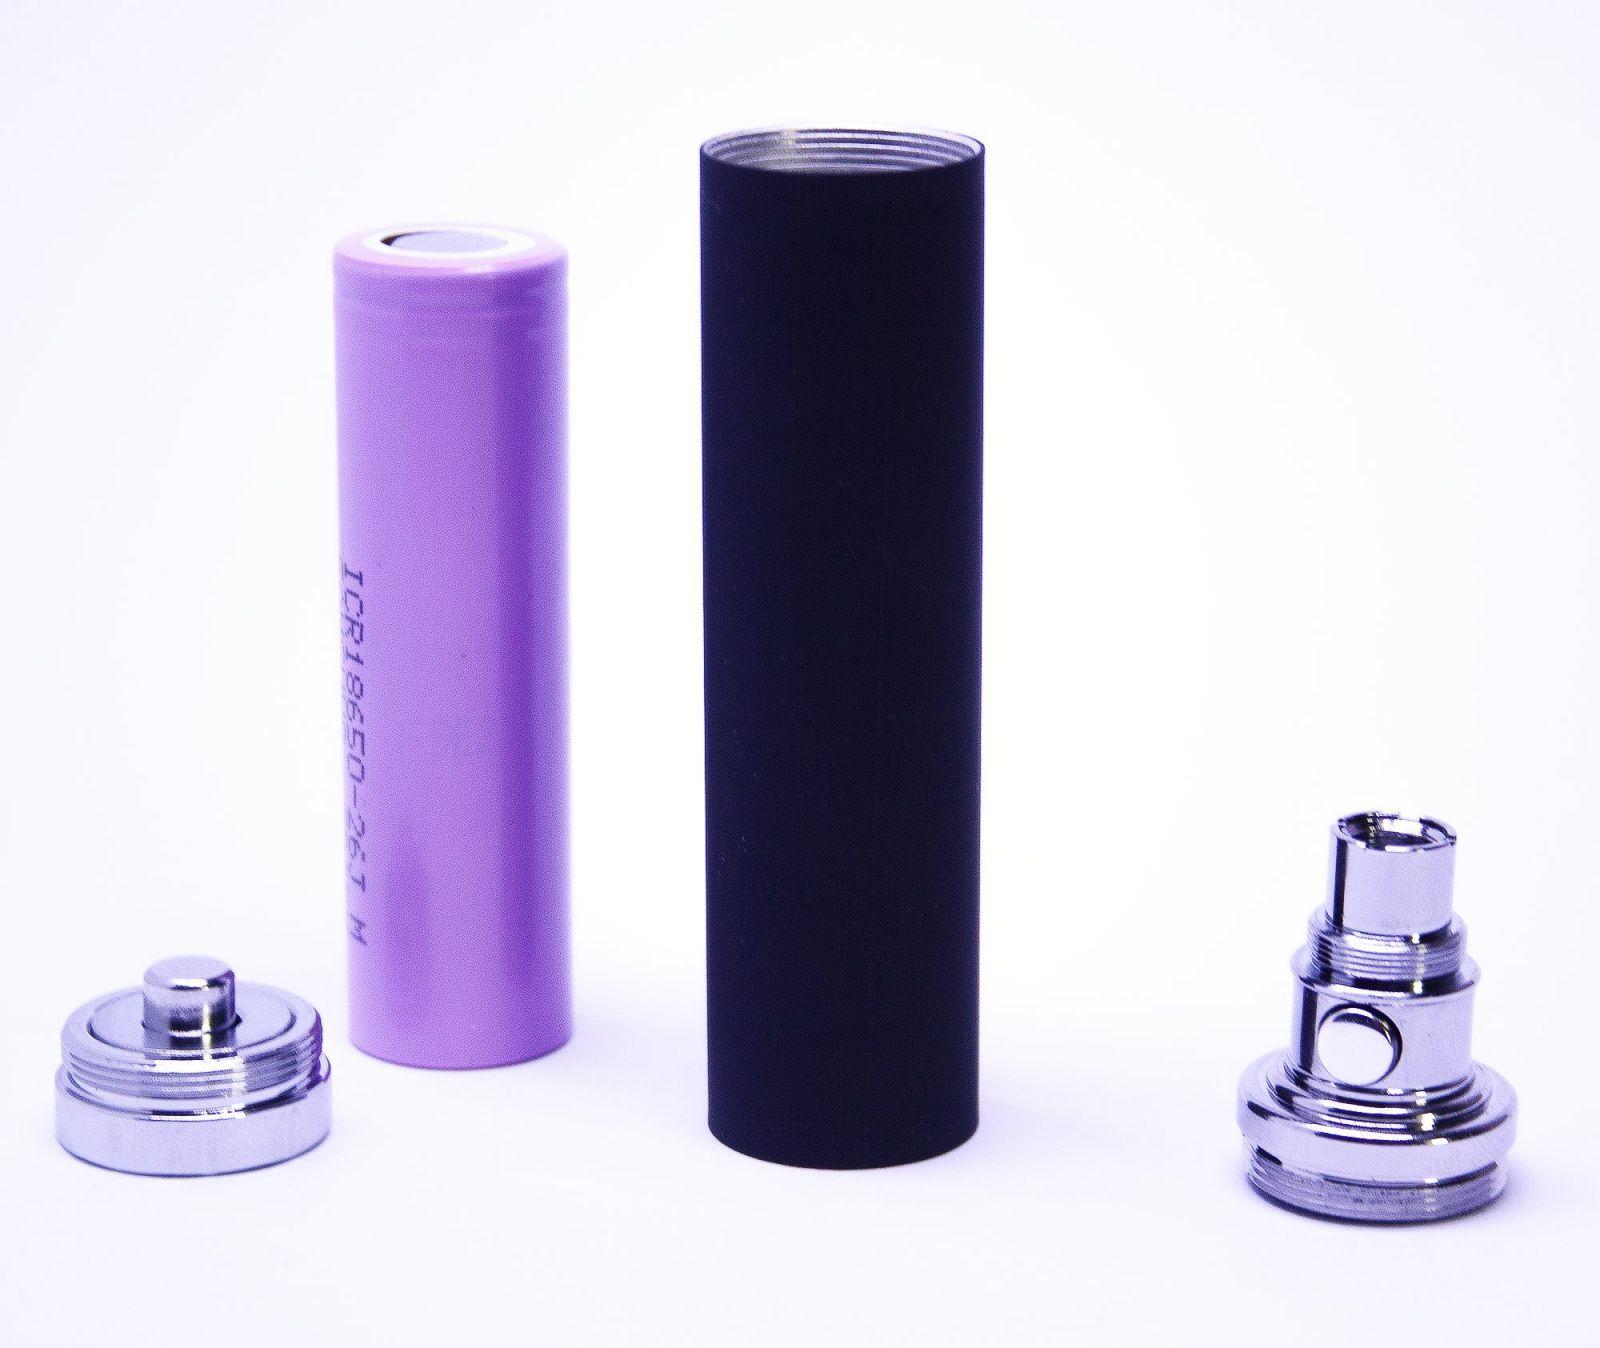 JomoTech 2600mah eGo Baterie Jomotech 18650 Grip